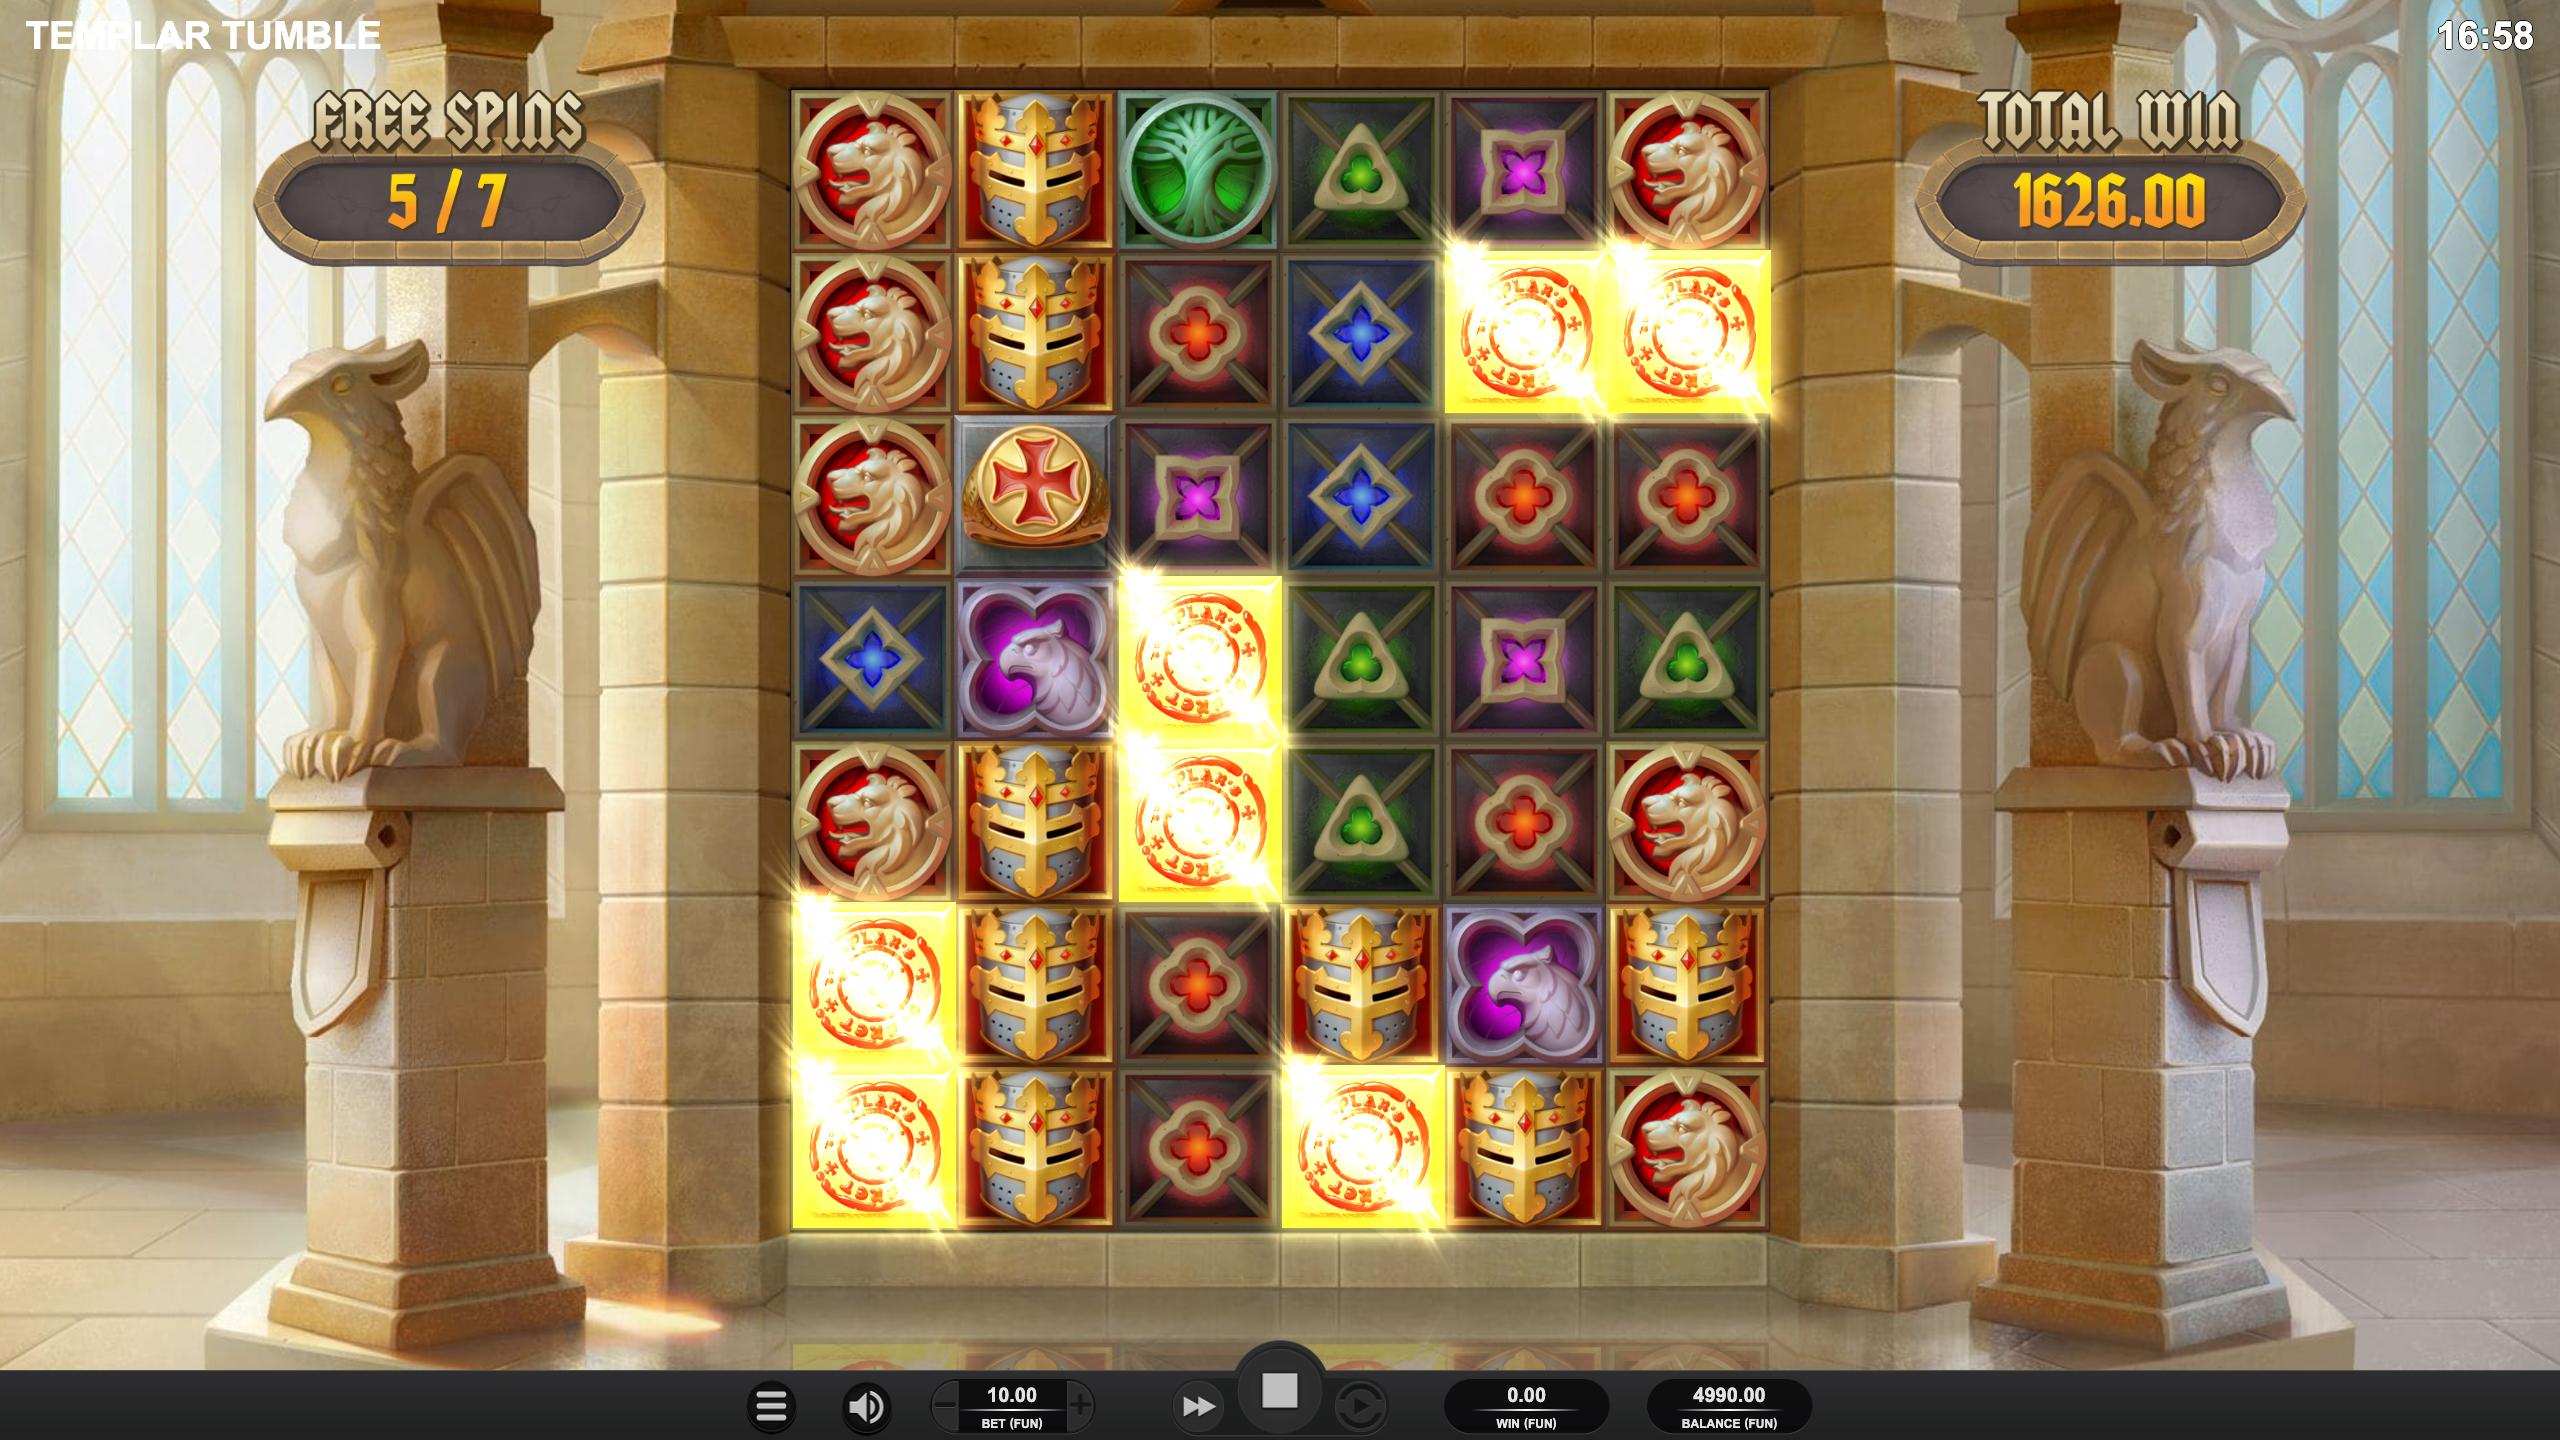 Templar Tumble Screenshot